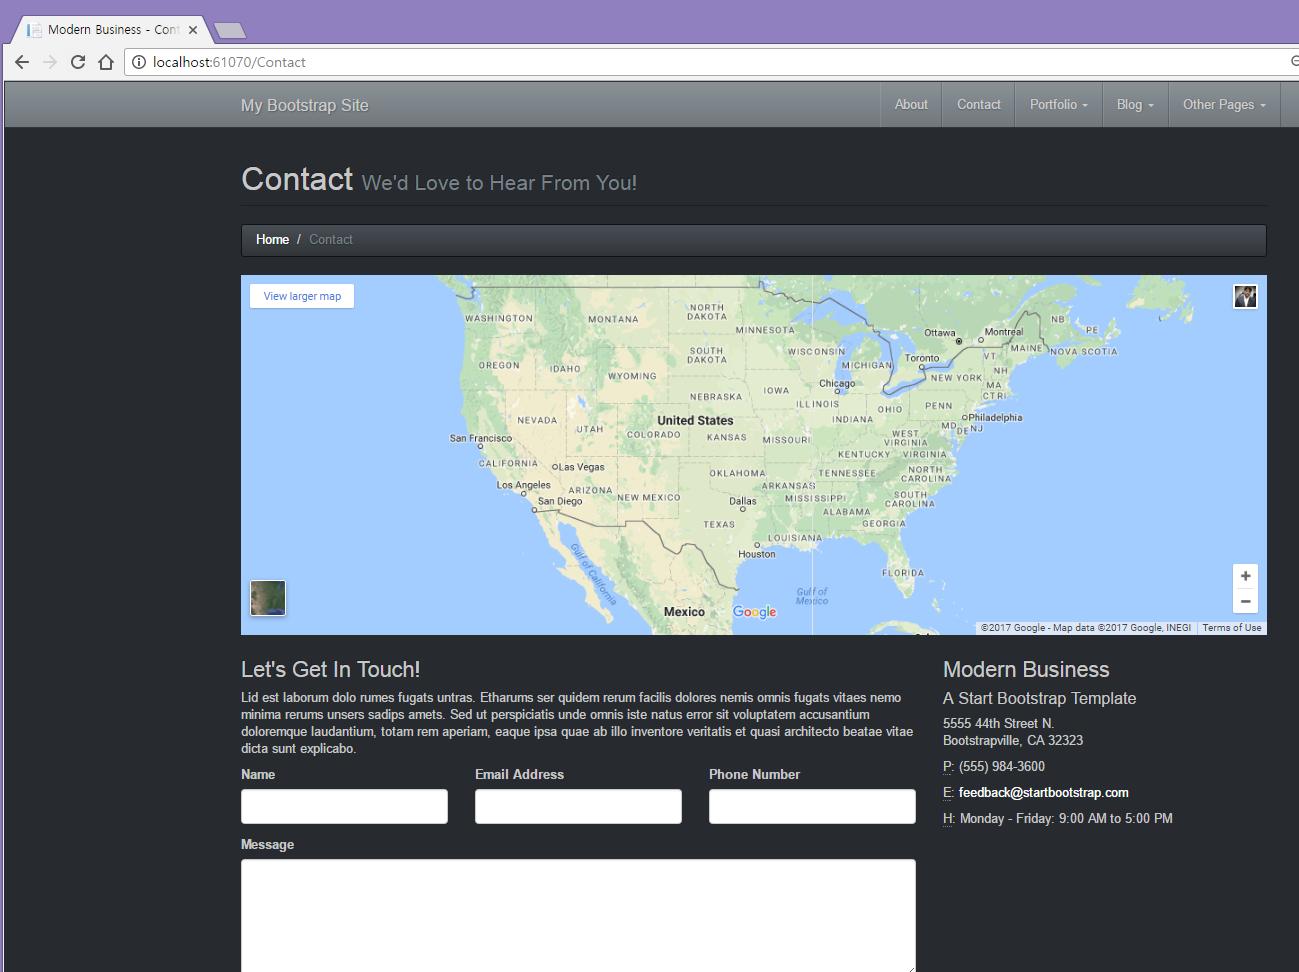 Customizing ASP.NET MVC Bootstrap Templates - TechNet Articles ...